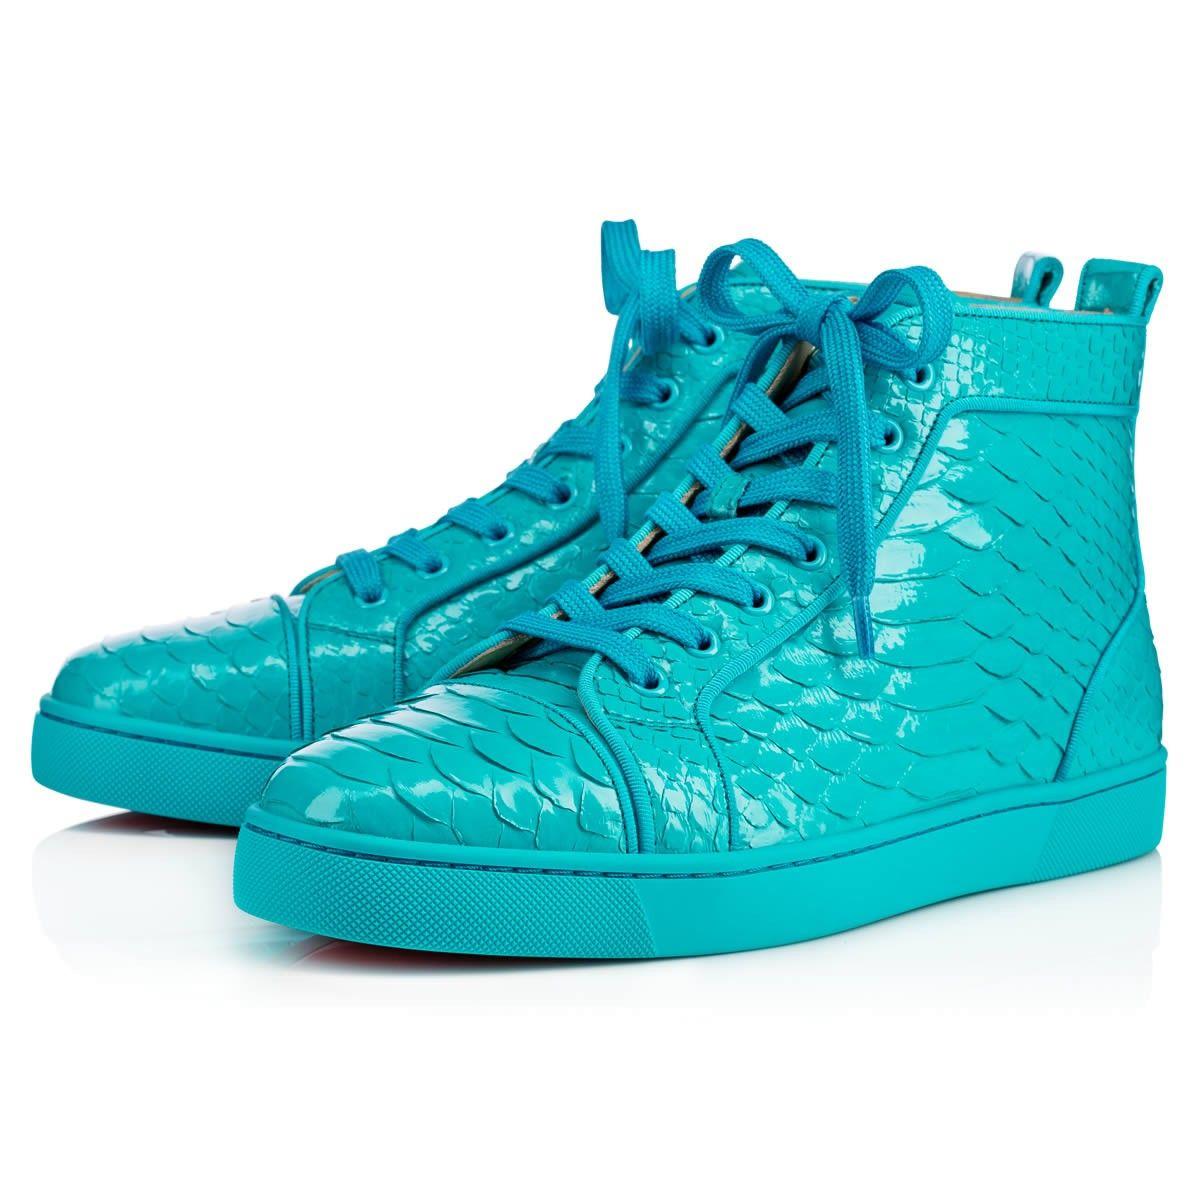 b3884ccc4b17 CHRISTIAN LOUBOUTIN Louis Men S Flat Pacific Python Crystal.   christianlouboutin  shoes